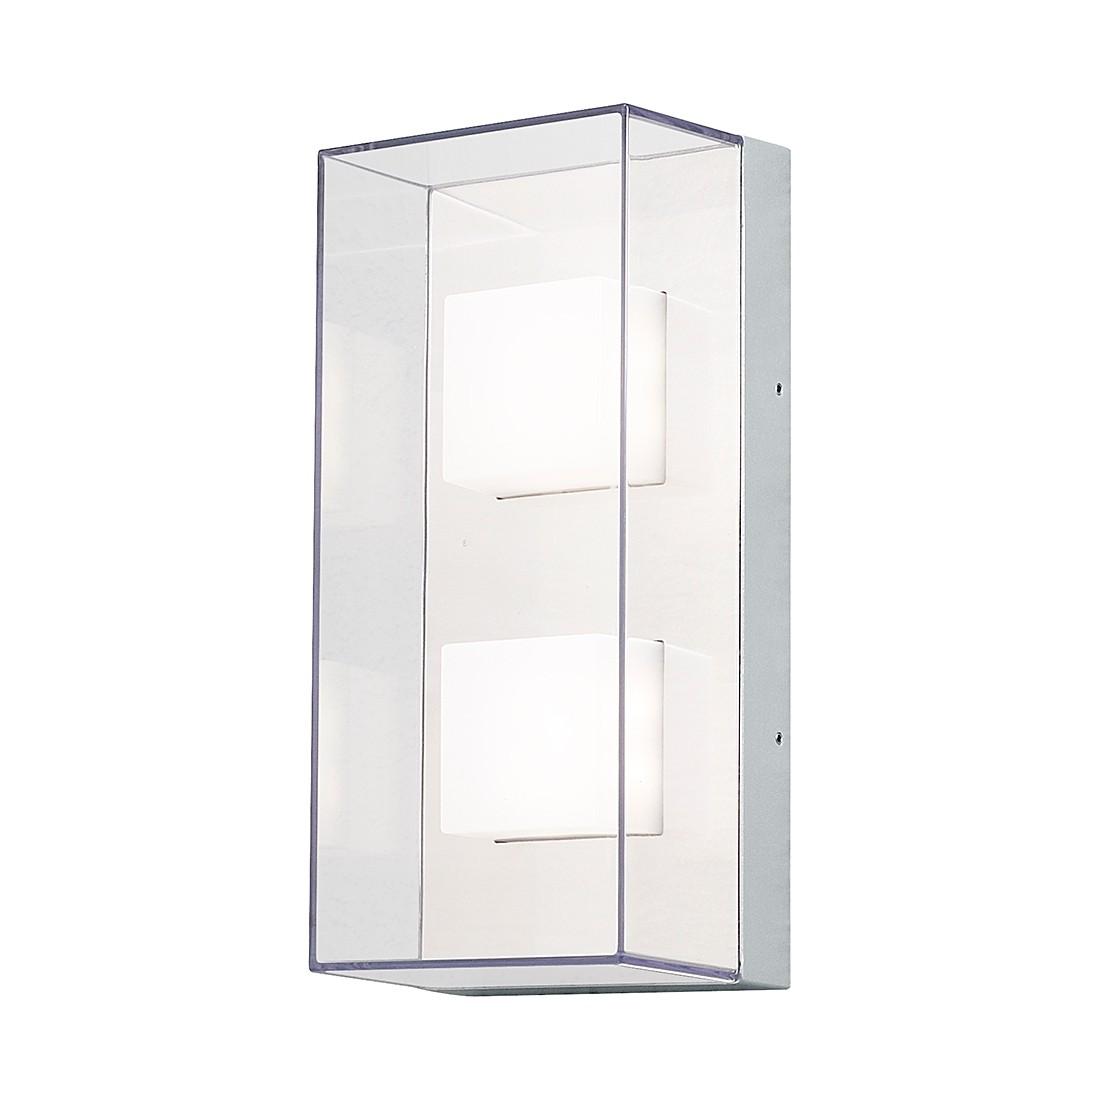 EEK A+, LED Wand- Deckenleuchte Sanremo – Aluminium/Glas – 8-flammig, Konstsmide günstig kaufen